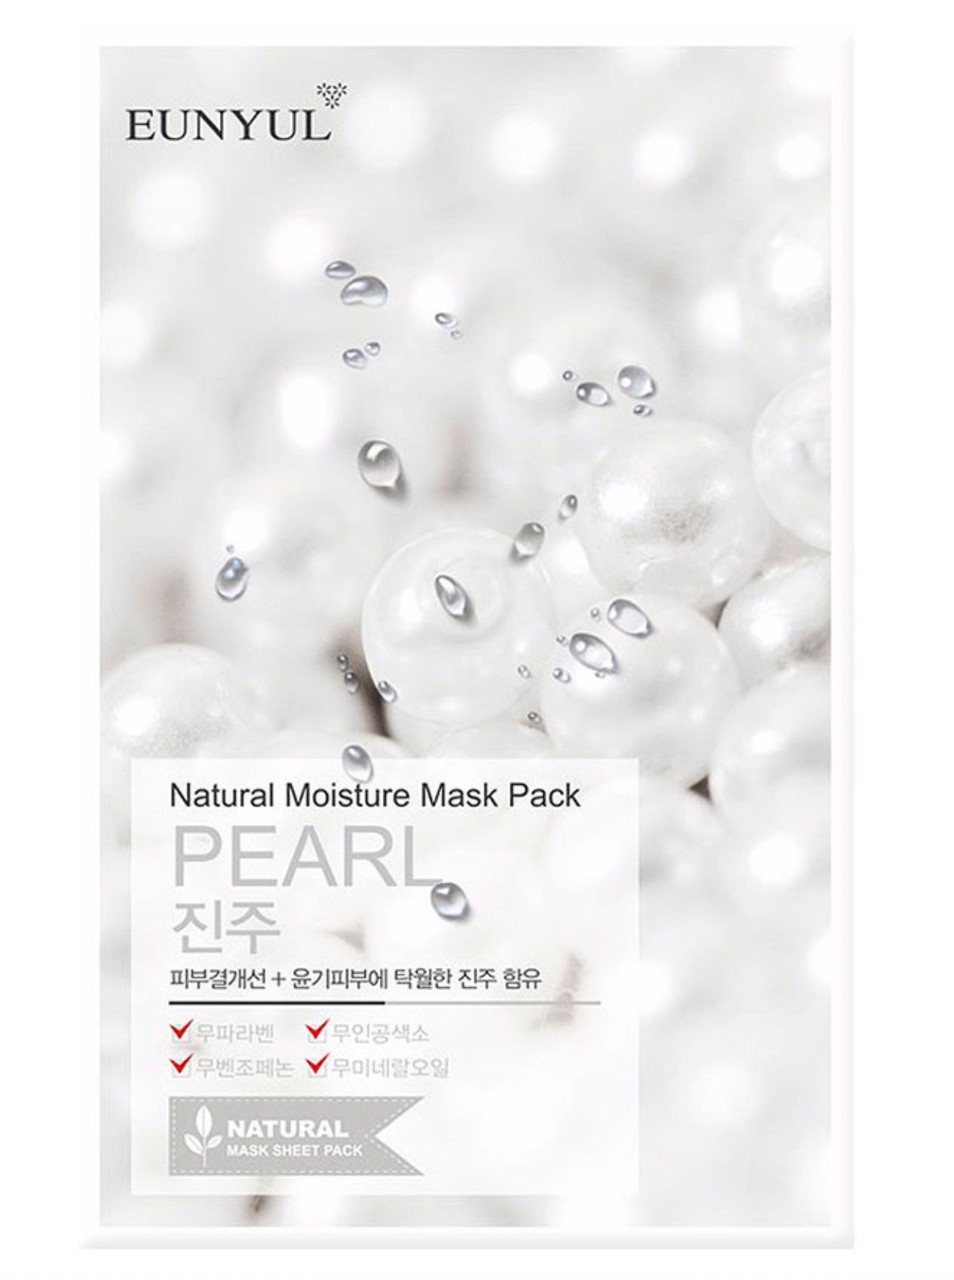 Увлажняющая тканевая маска для лица с жемчугом Eunyul Natural Moisture Mask Pack Pearl 25 мл (8809435402142)